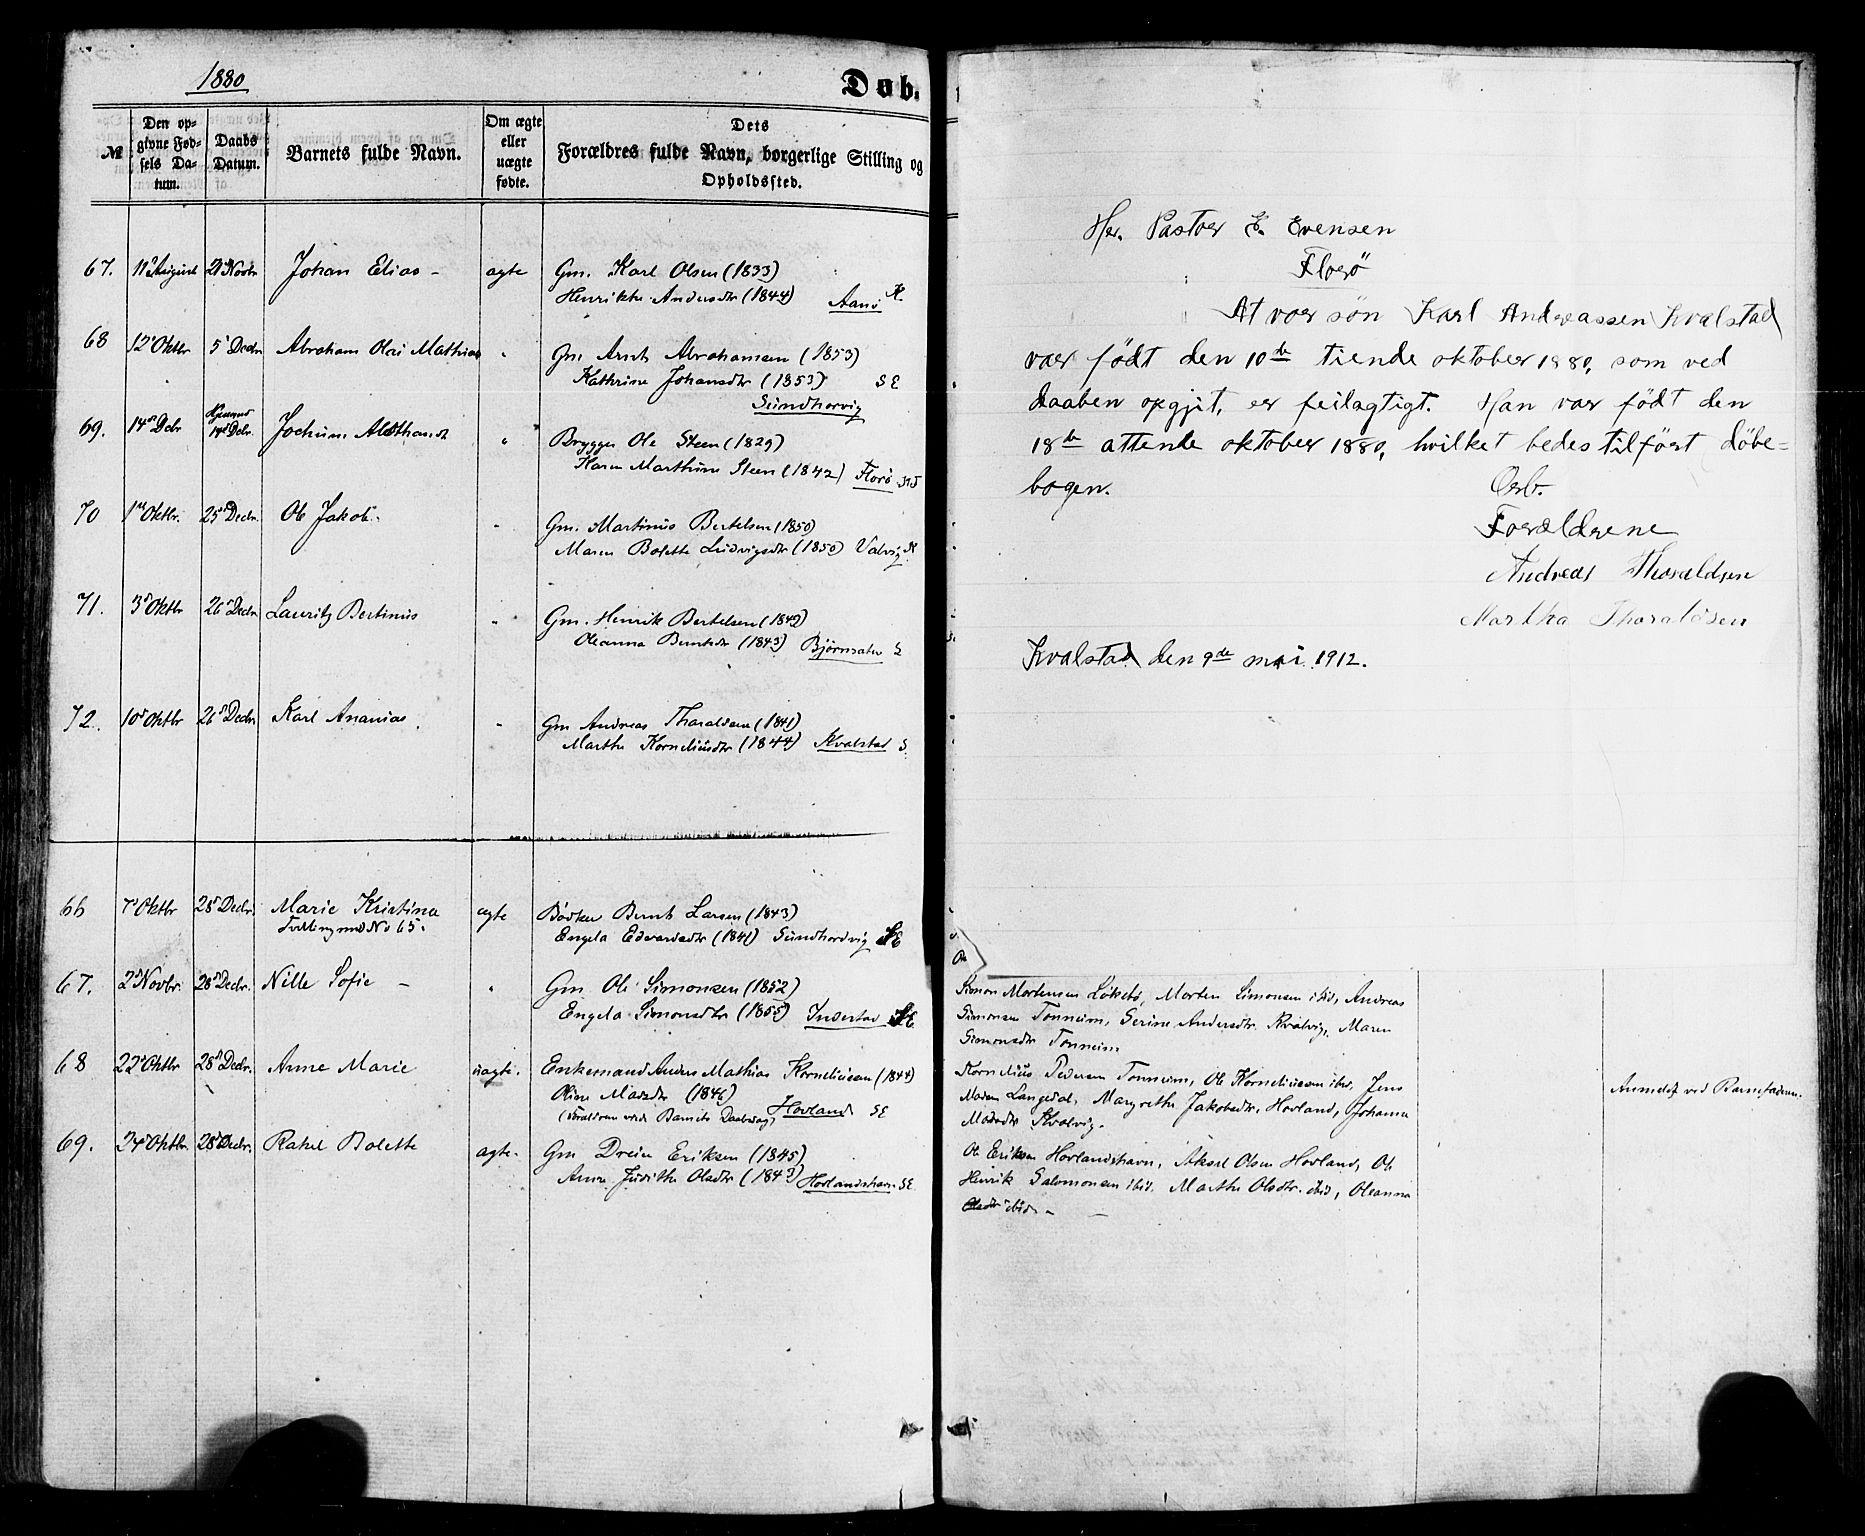 SAB, Kinn sokneprestembete, H/Haa/Haaa/L0006: Parish register (official) no. A 6, 1857-1885, p. 251